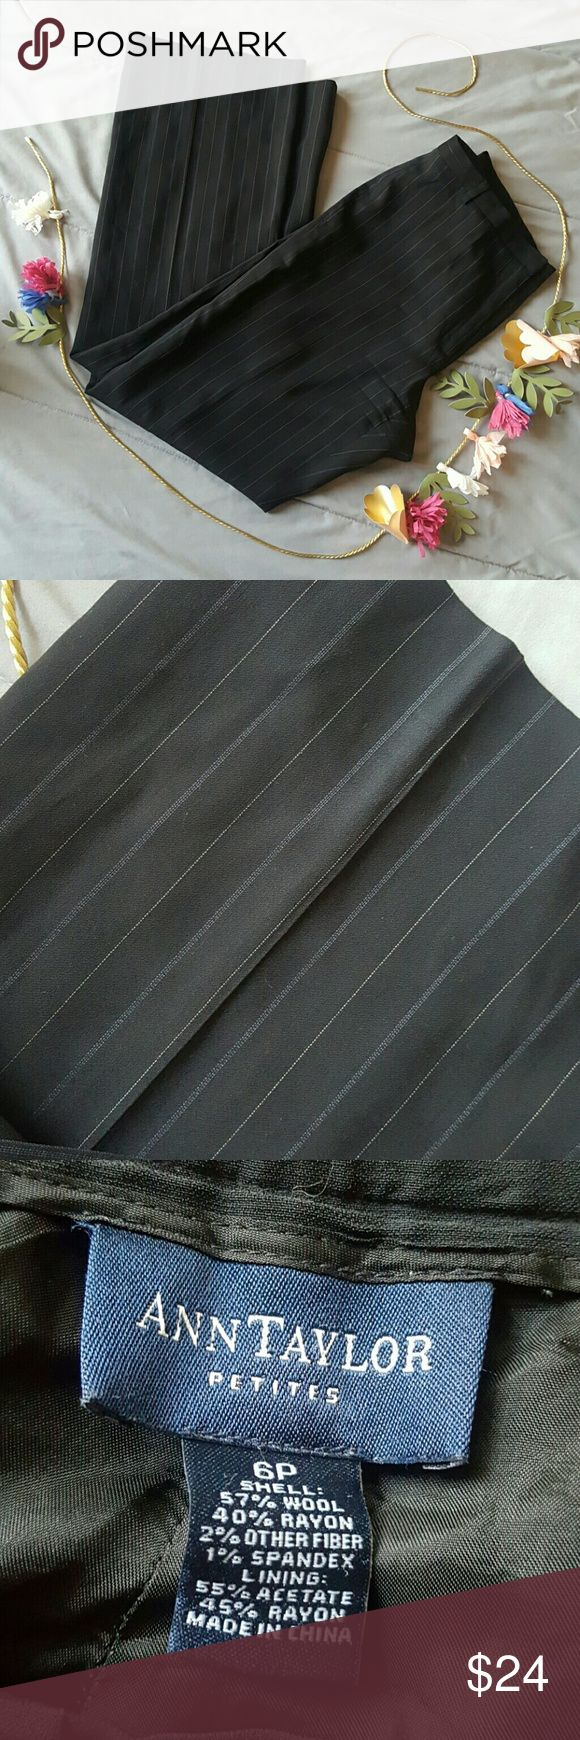 Ann Taylor The Petite Trouser size 6 Pin striped, black wth navy blue and white  Dress pants 6P - petite  Ann Taylor Ann Taylor Pants Trousers